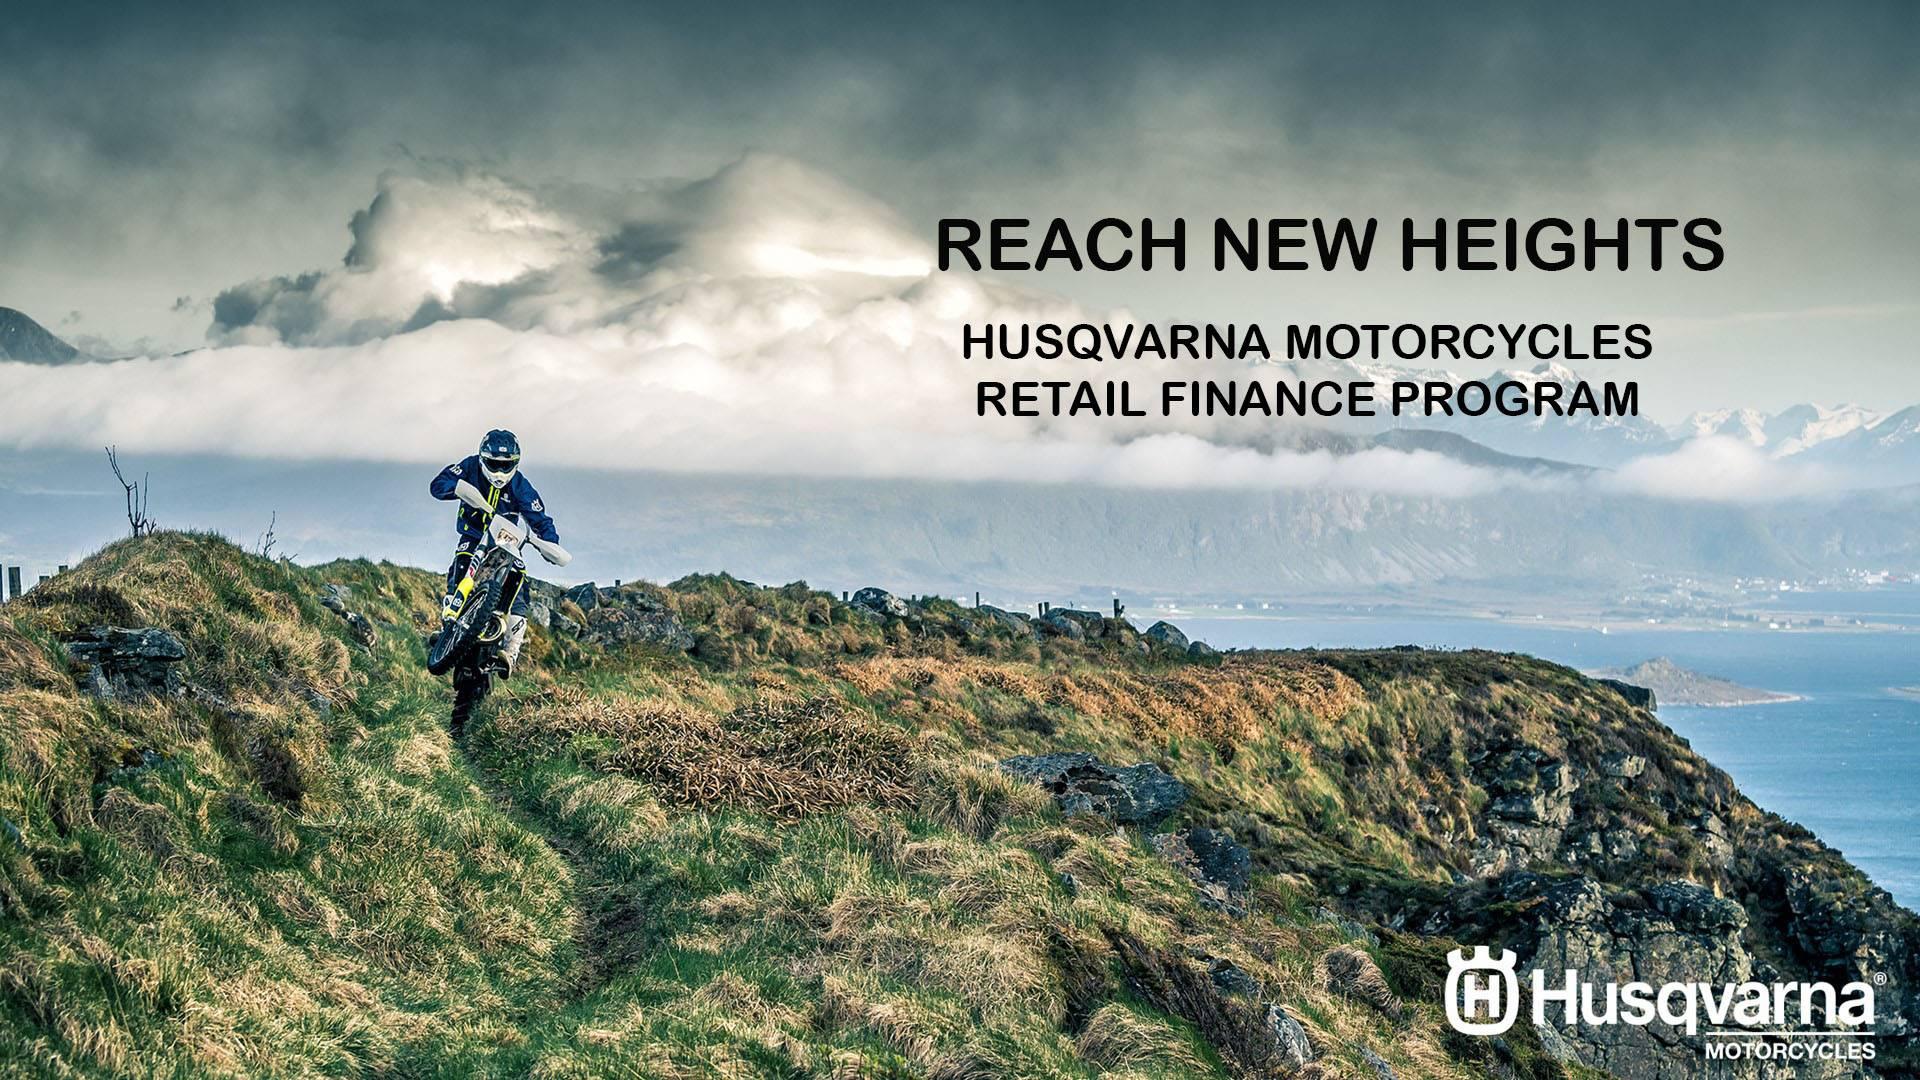 Husqvarna - Reach New Heights - Retail Finance Program